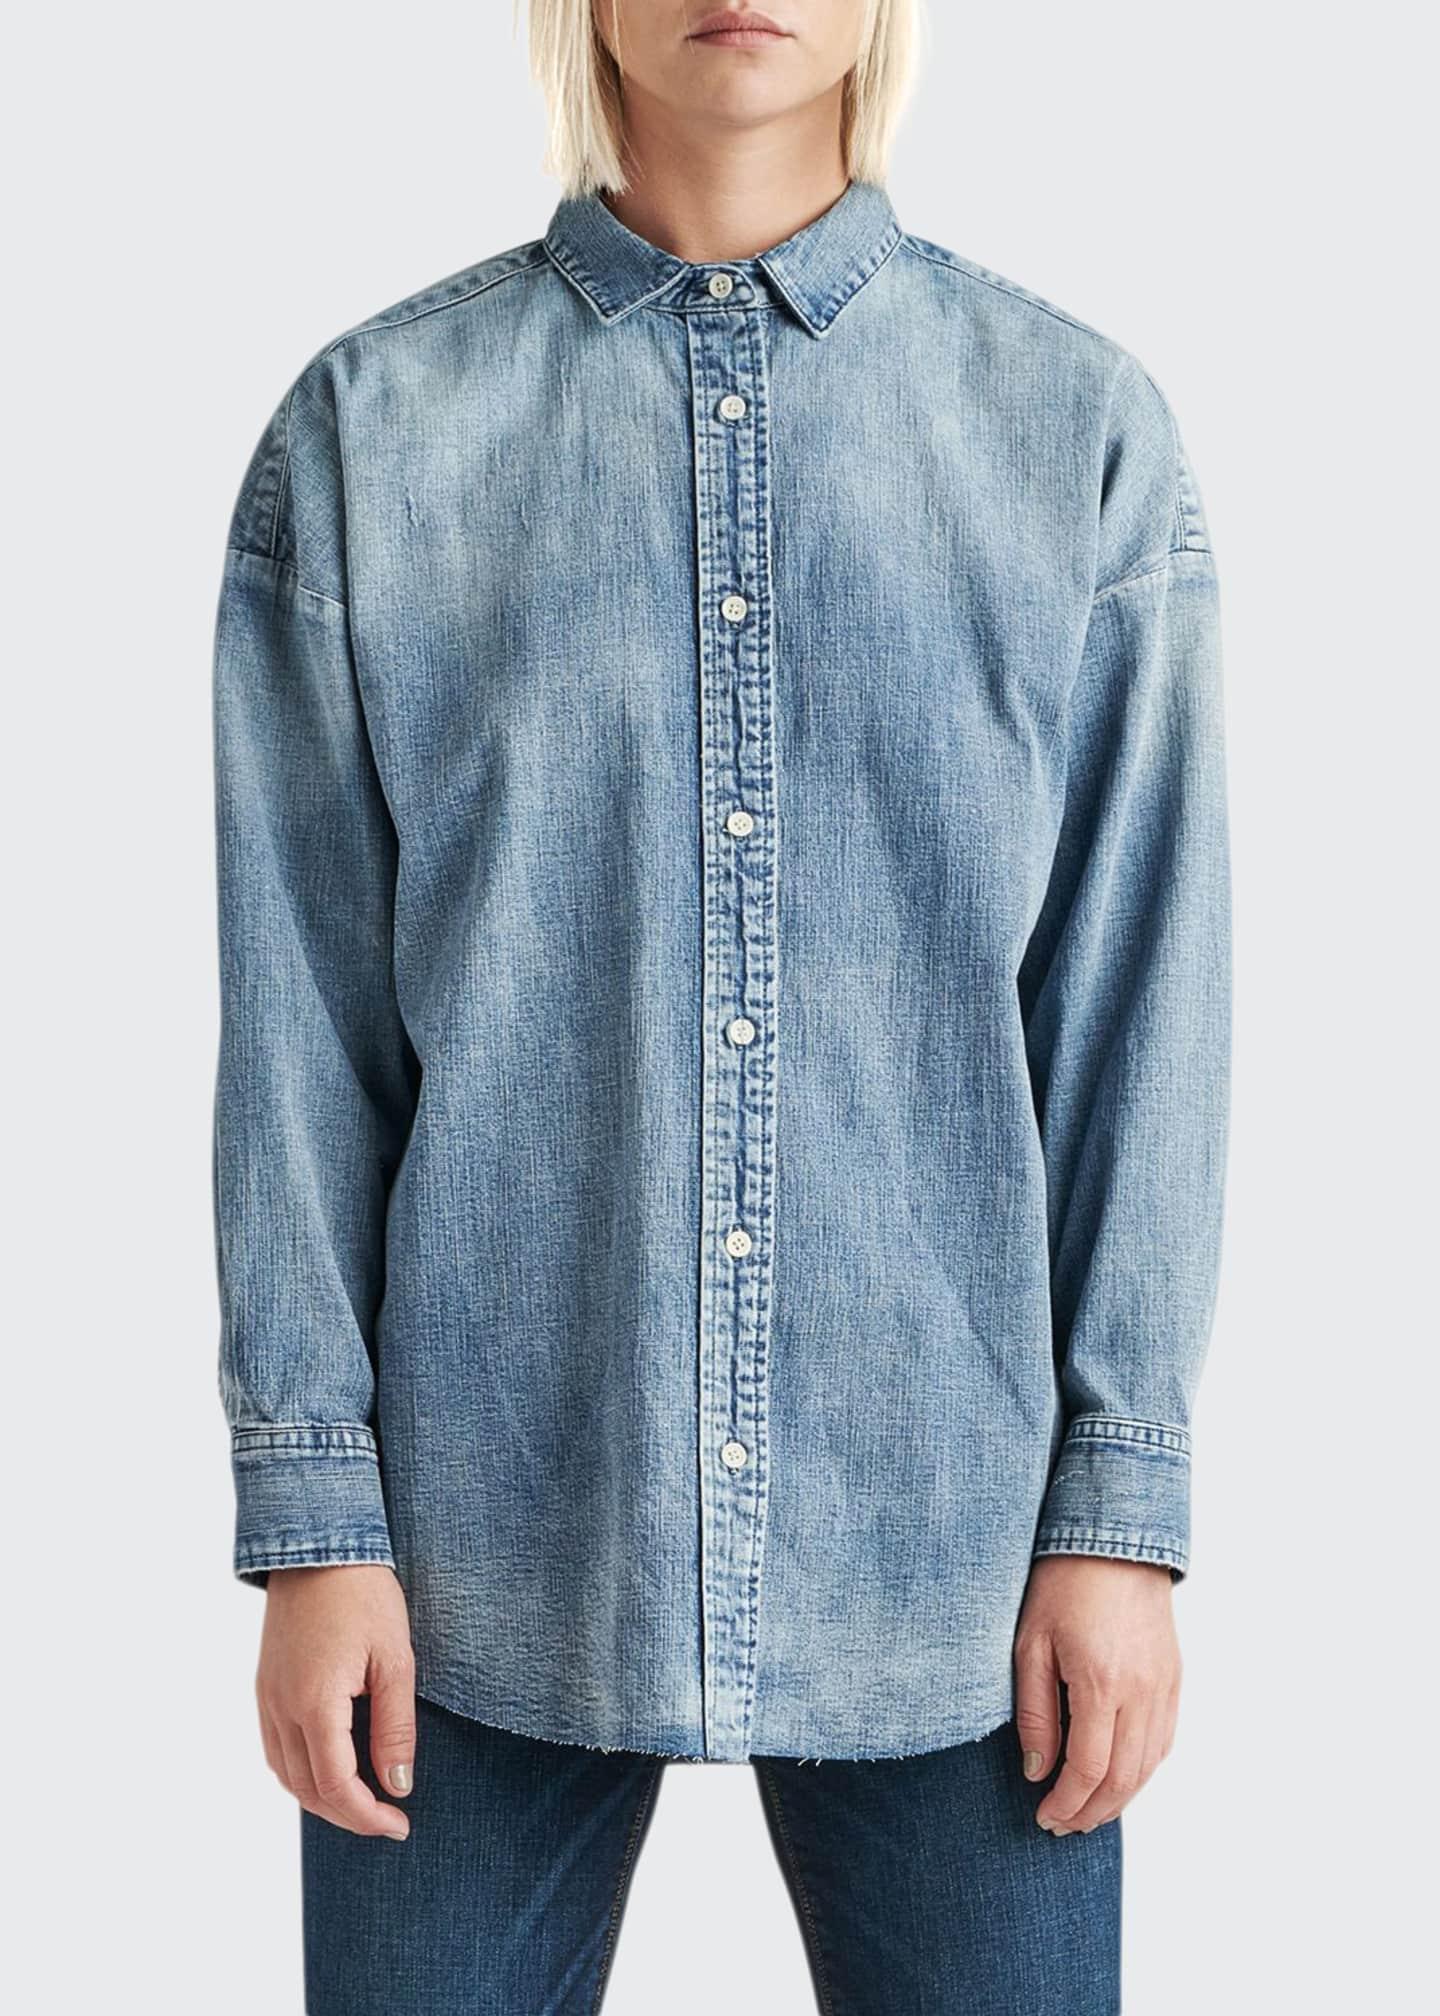 Hudson The Button Up Raw-Edge Chambray Shirt